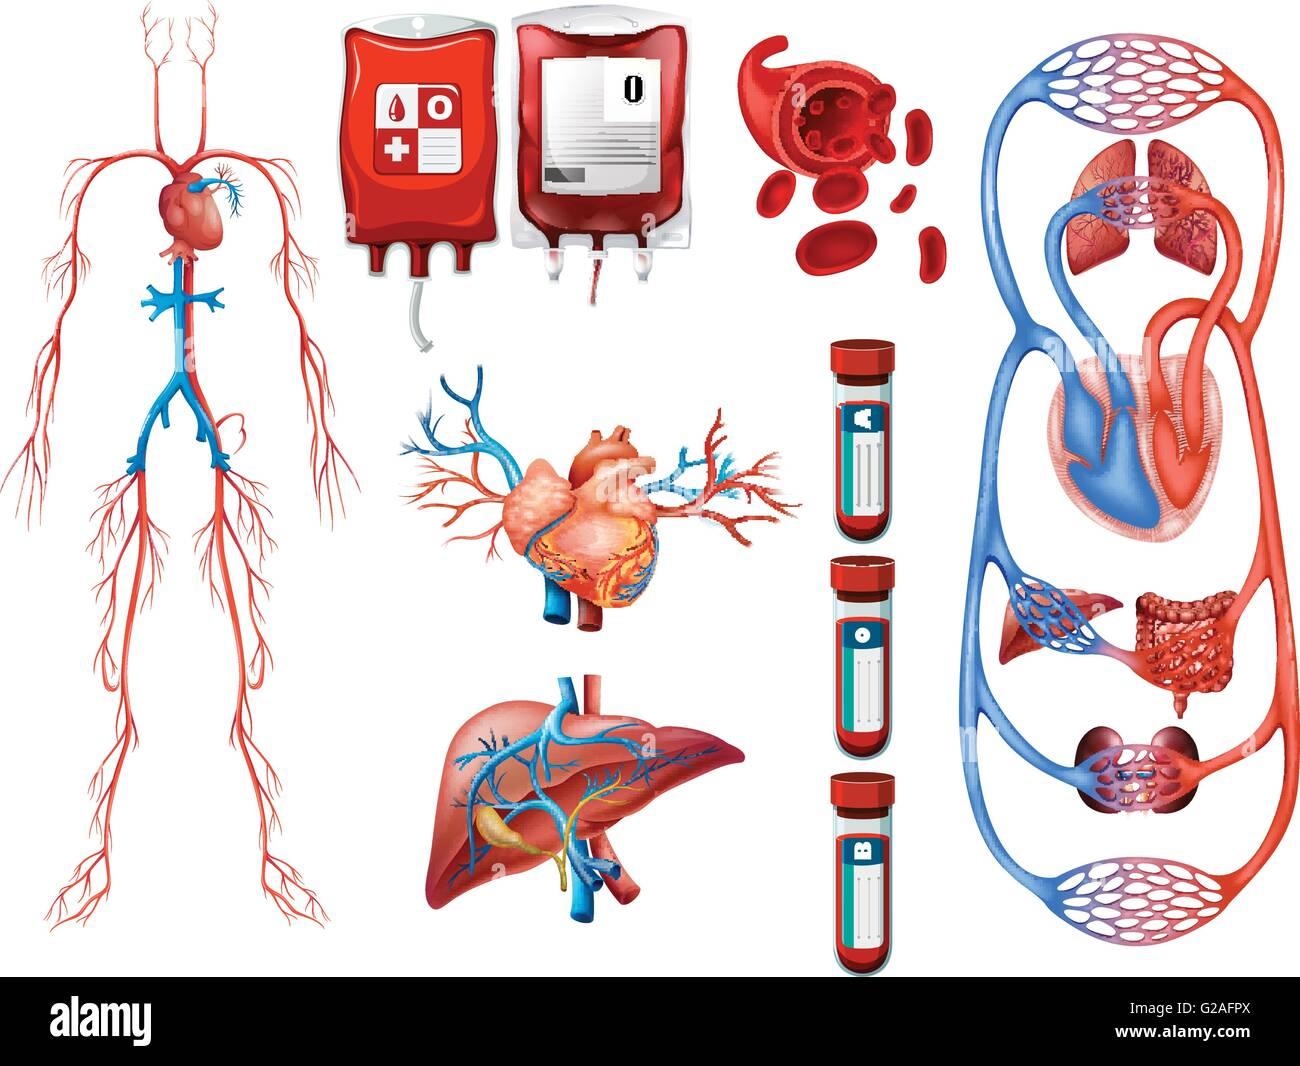 Cardiovascular System Stockfotos & Cardiovascular System Bilder - Alamy